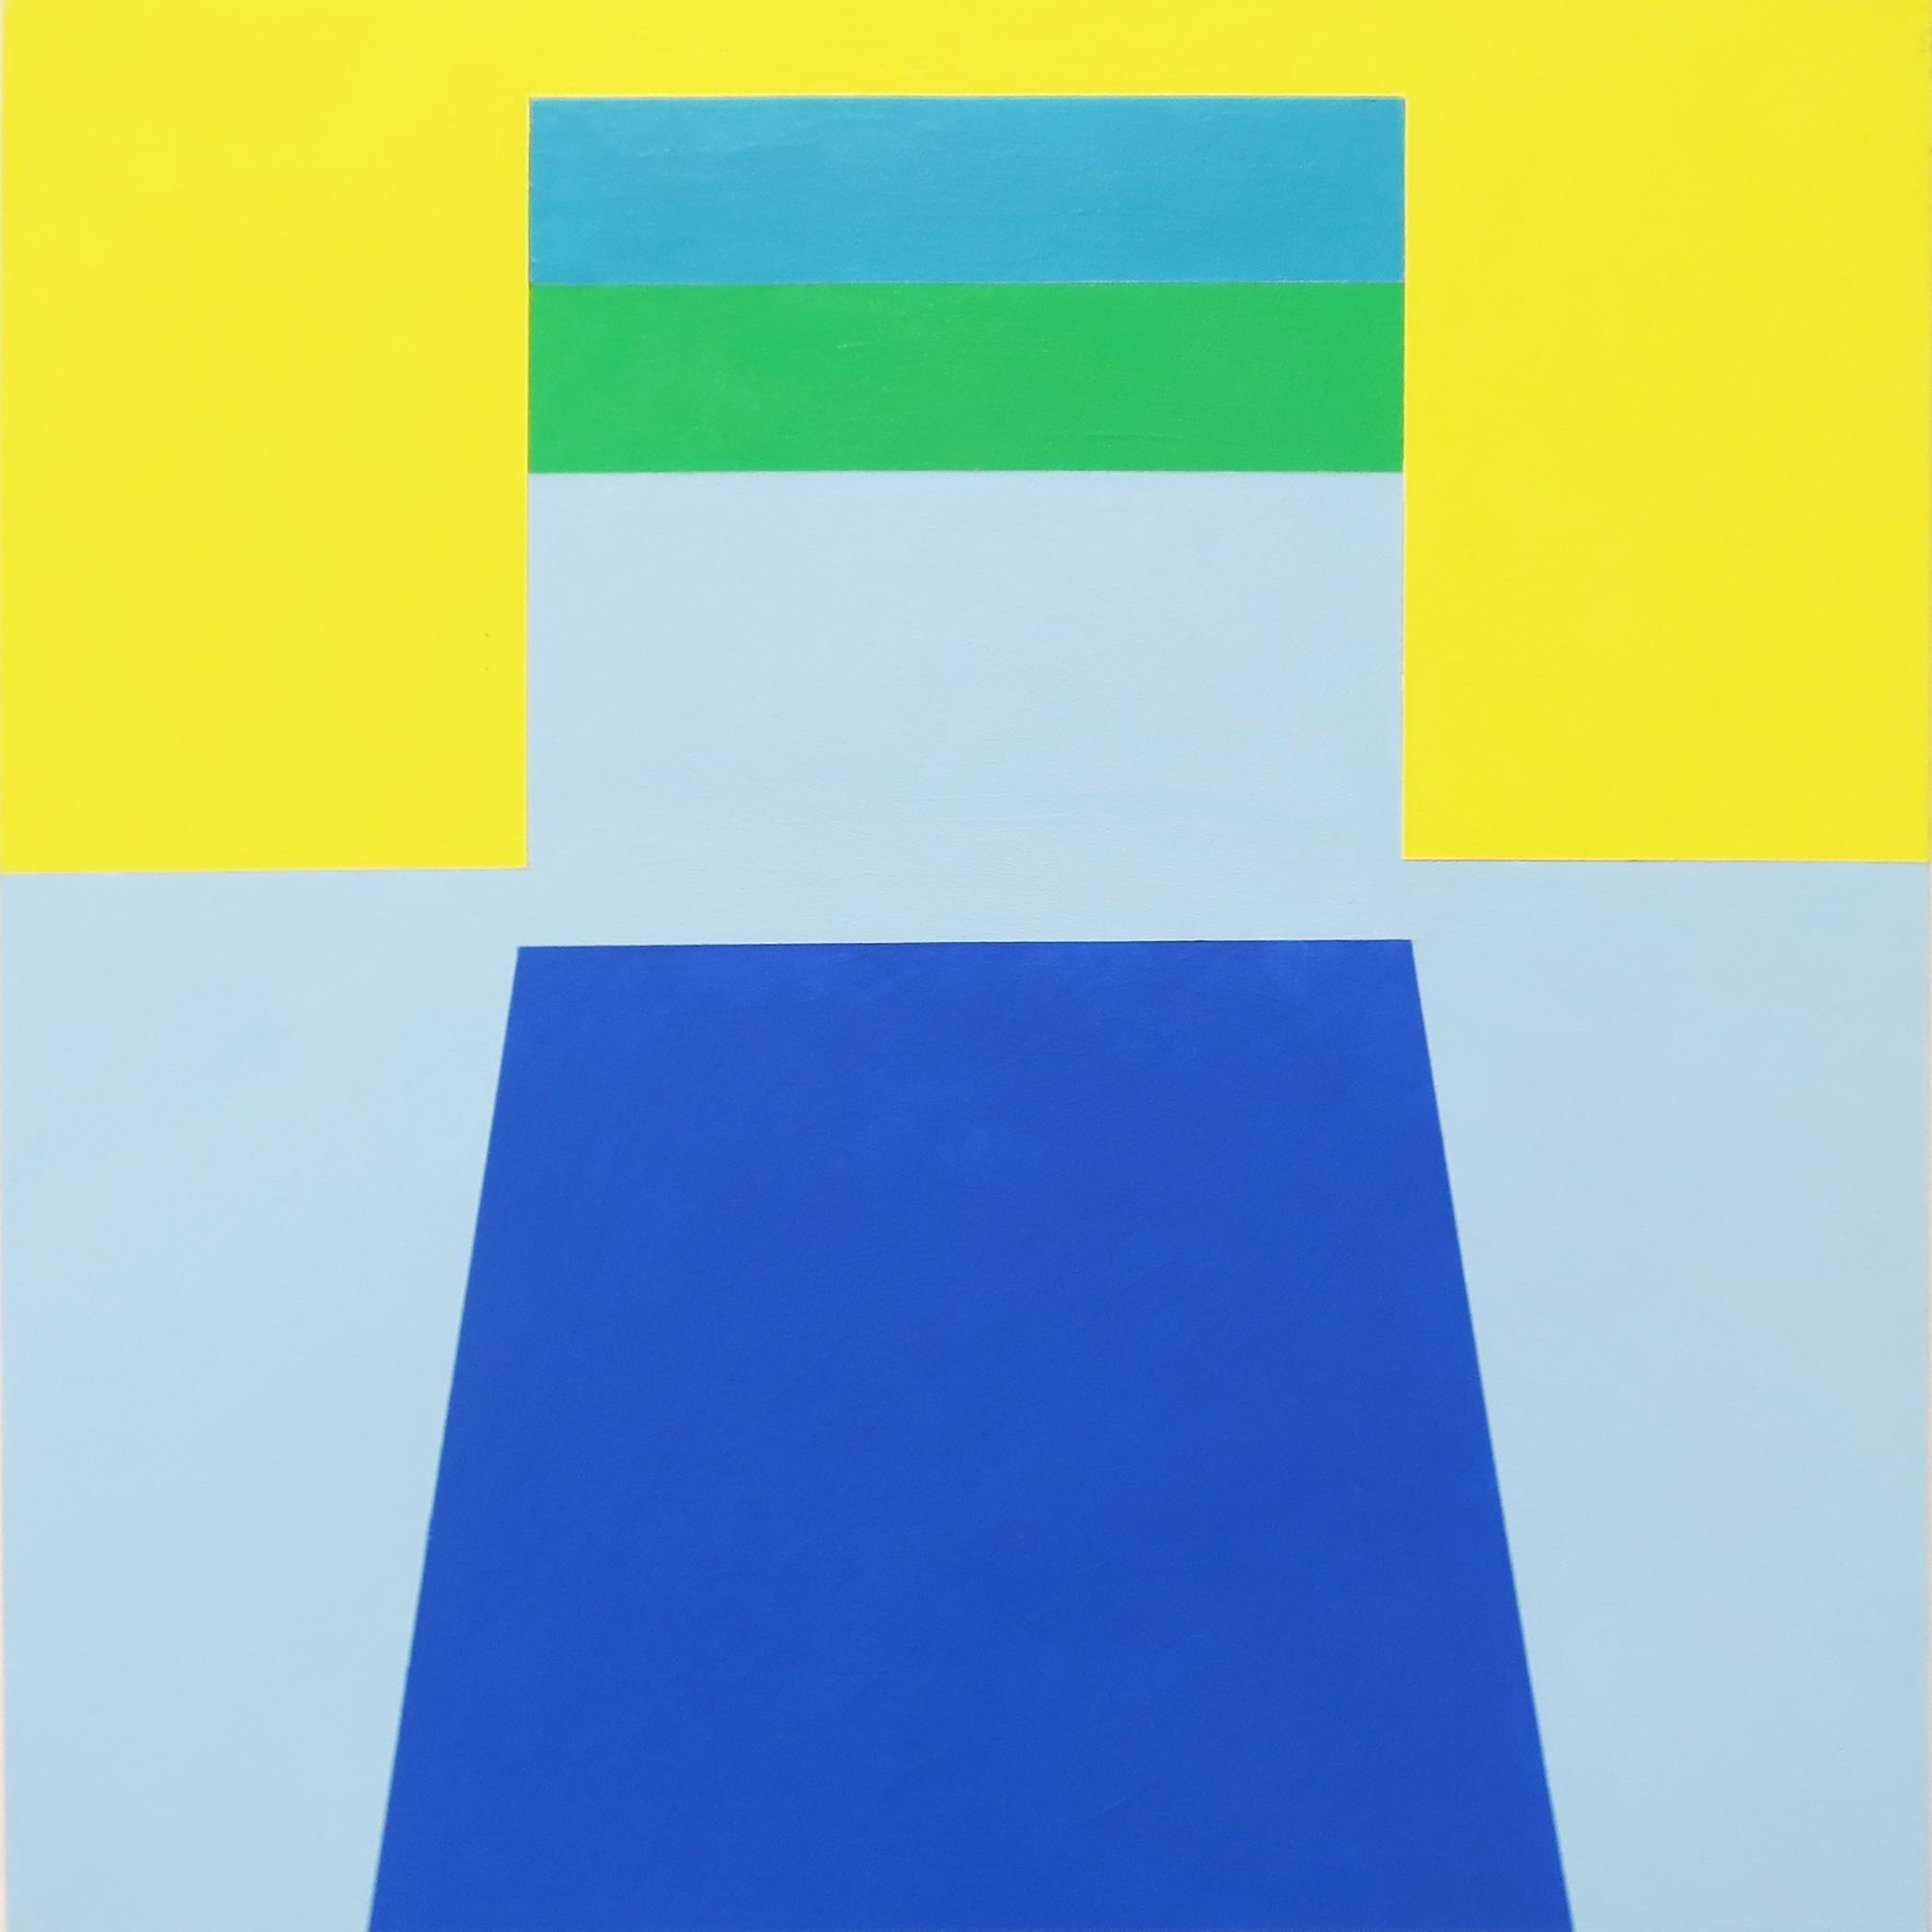 Scene 58, Geometric Interior space, Blue, Yellow, Green, Small Acrylic painting